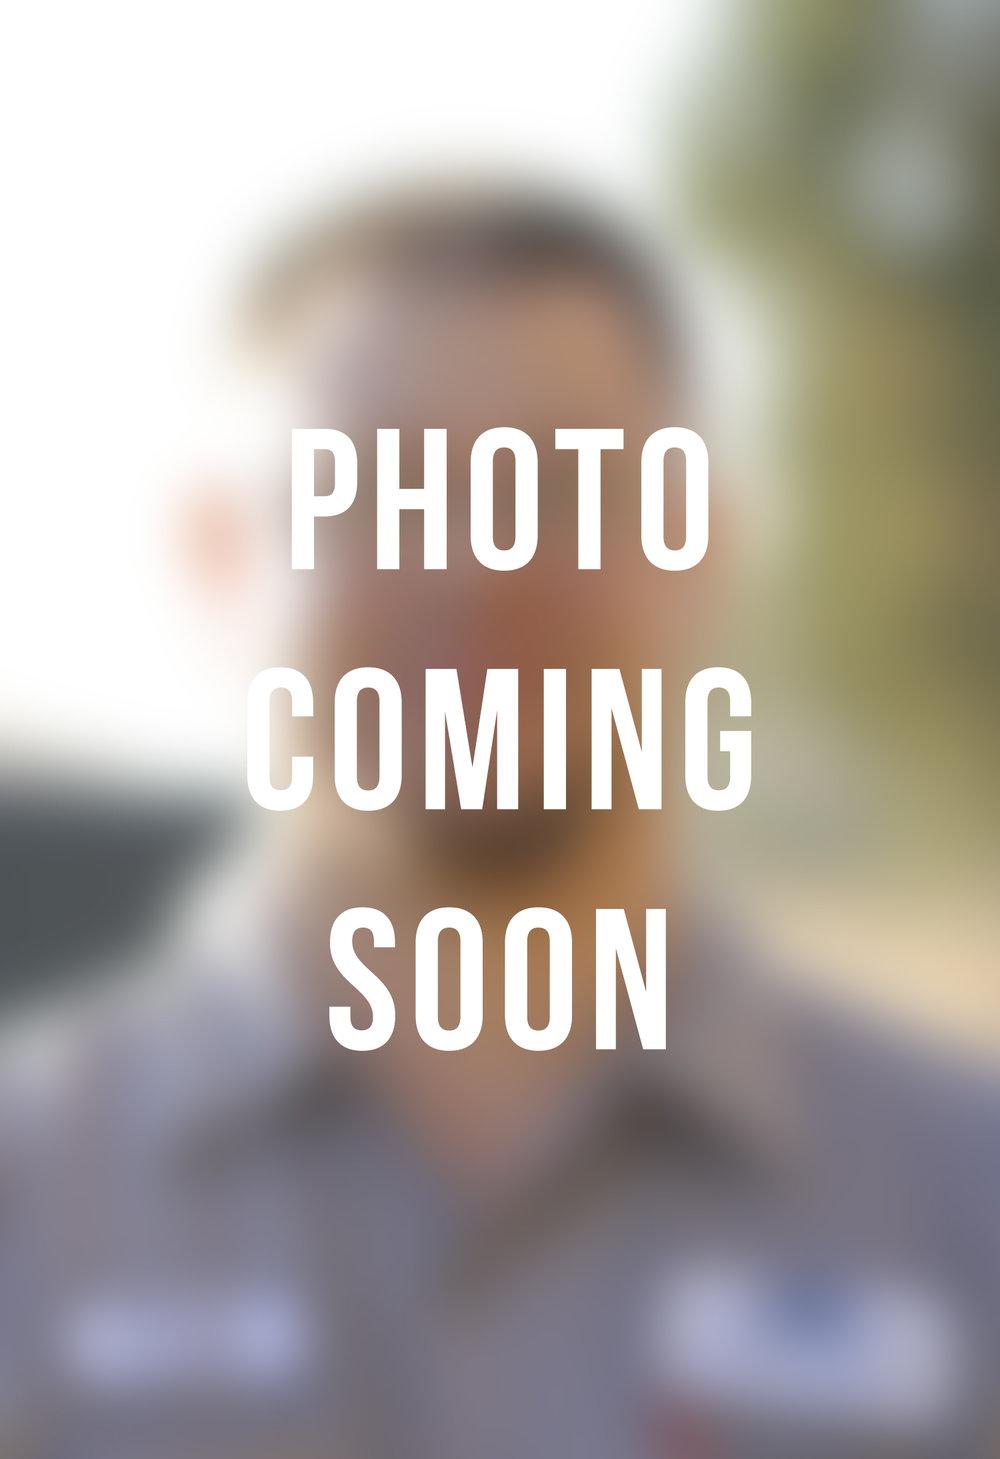 Legacy EQ - Photo Soon.jpg